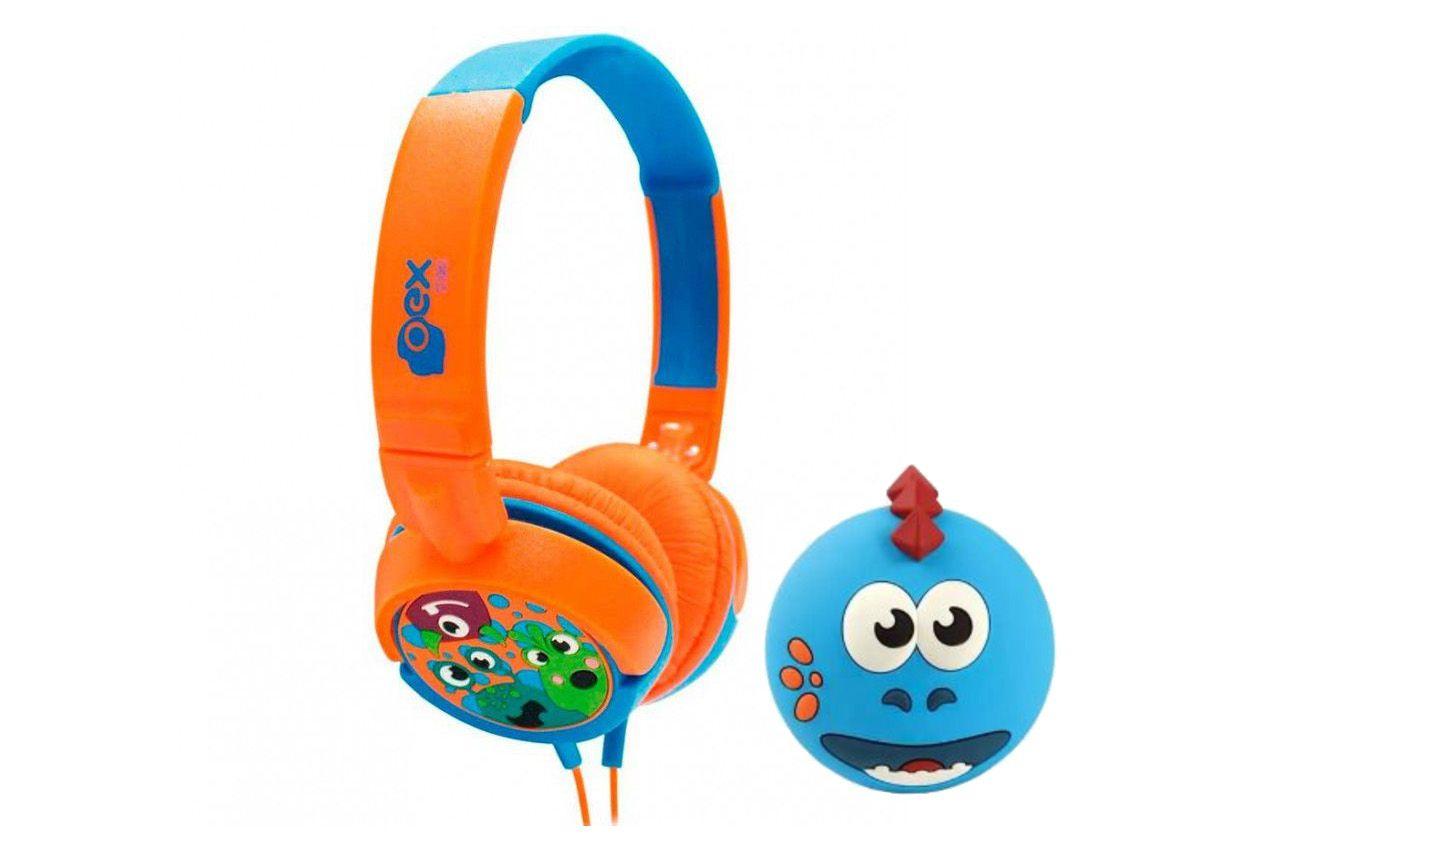 Caixinha Som Infantil Bluetooth Oex Dino Sk302 + Headphone Boo Hp-301